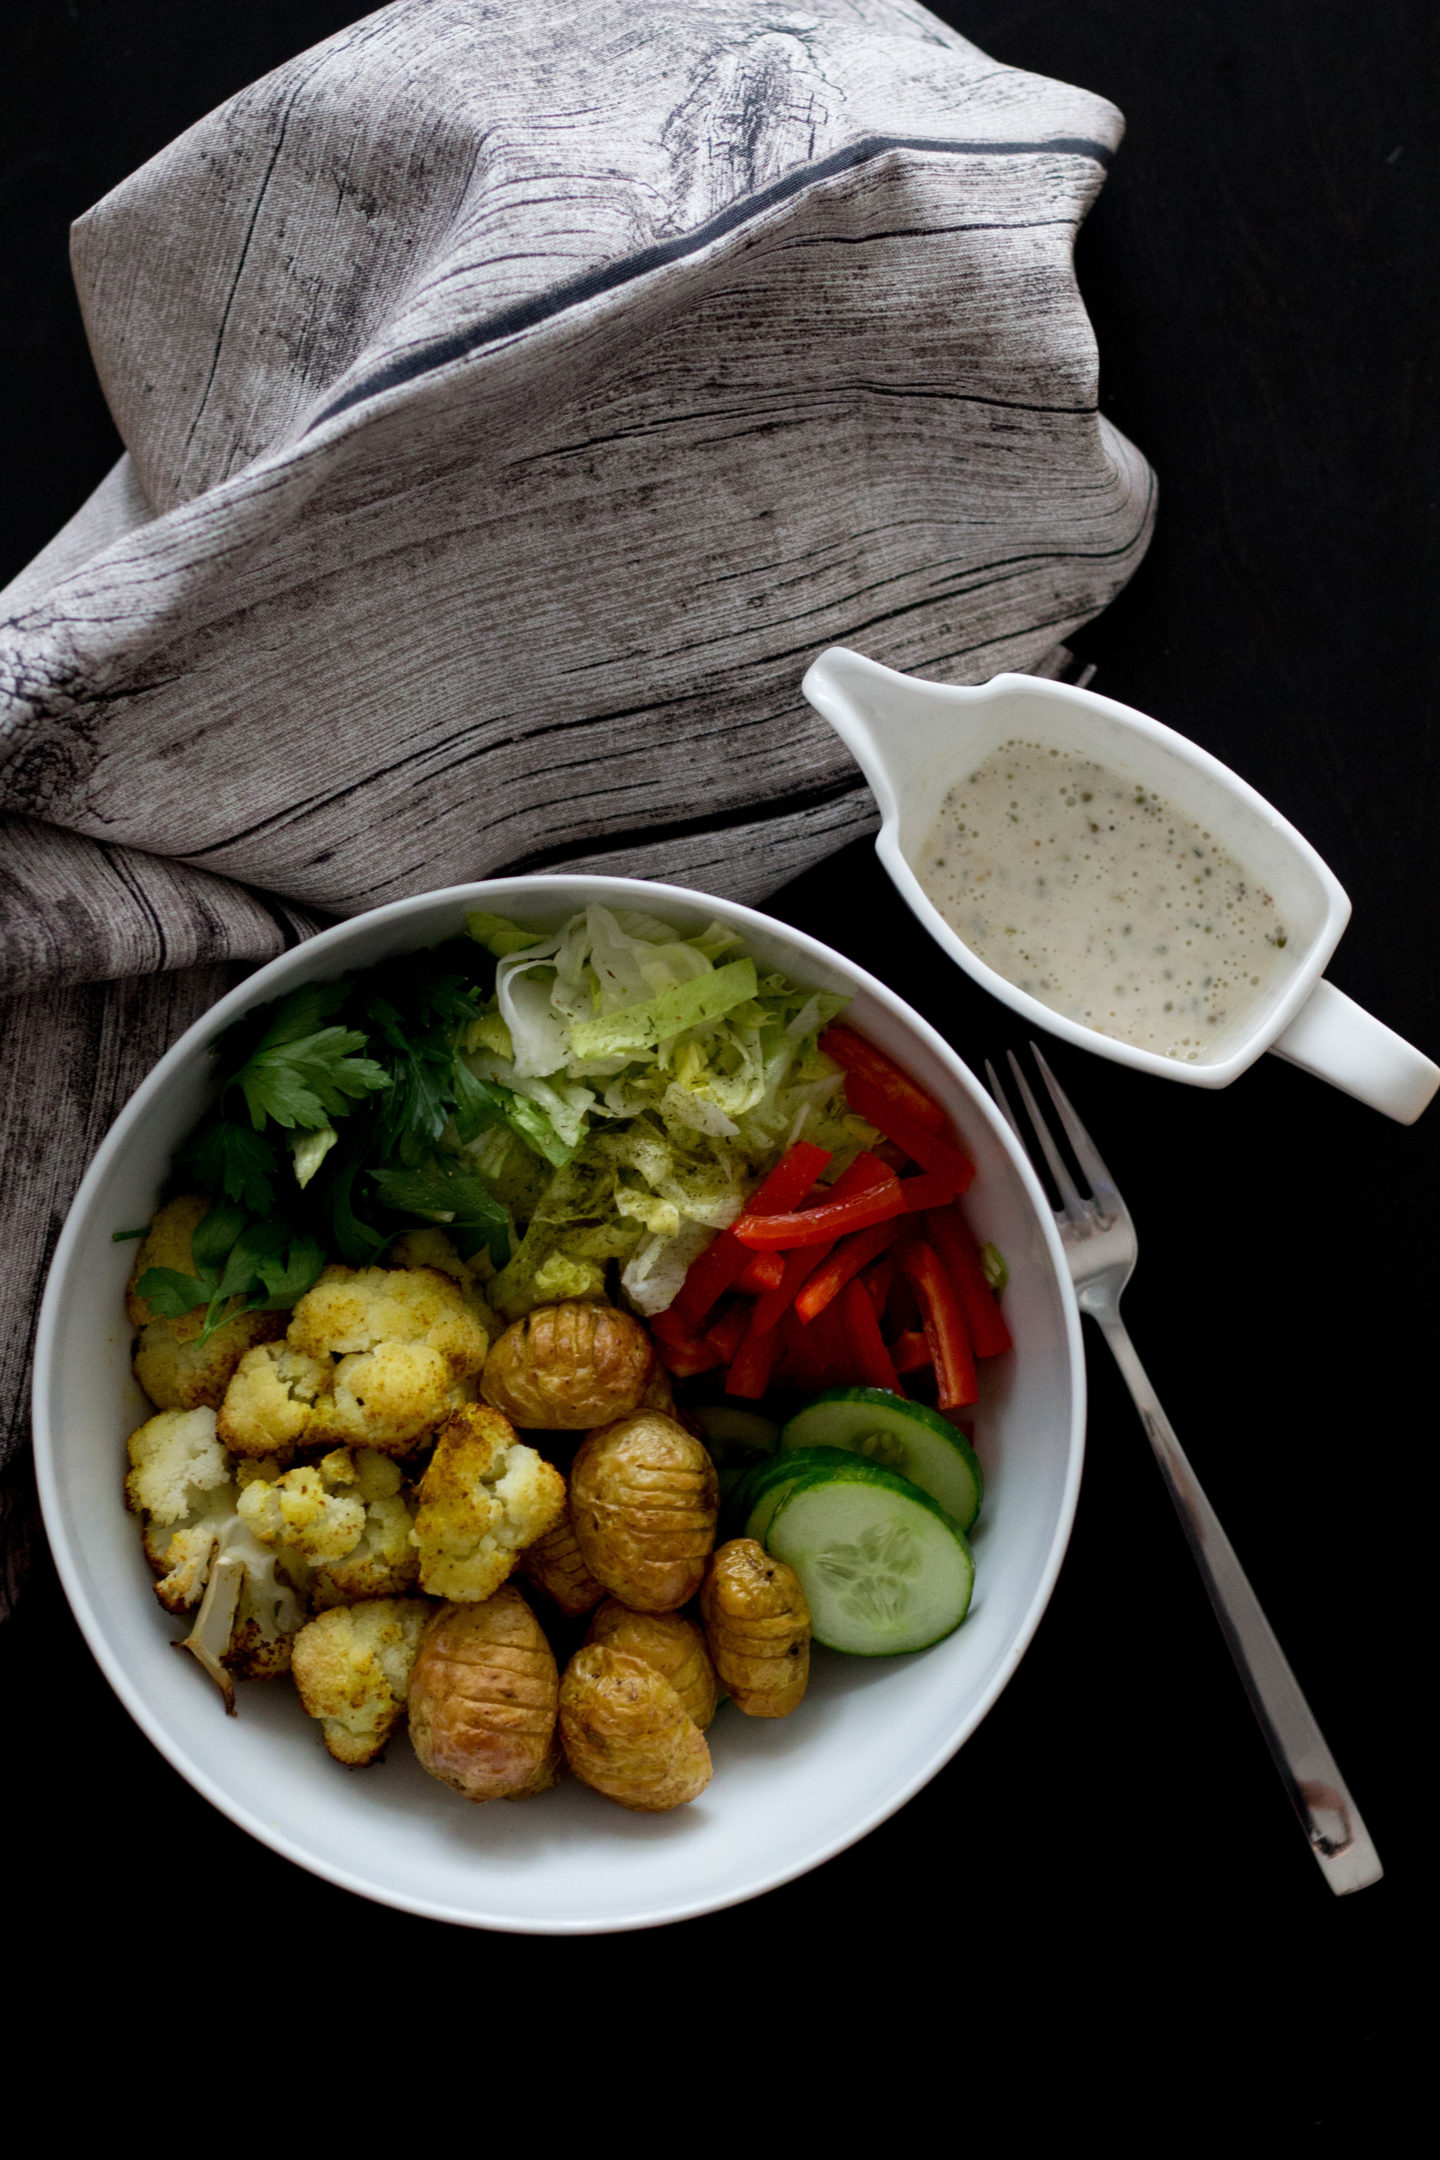 Vegan, Dein HomeSpa, Austria, Mostviertel, Bowl, Caesar Dressing, Karfiol, Cooking, Cleaneating, Kräuterküche